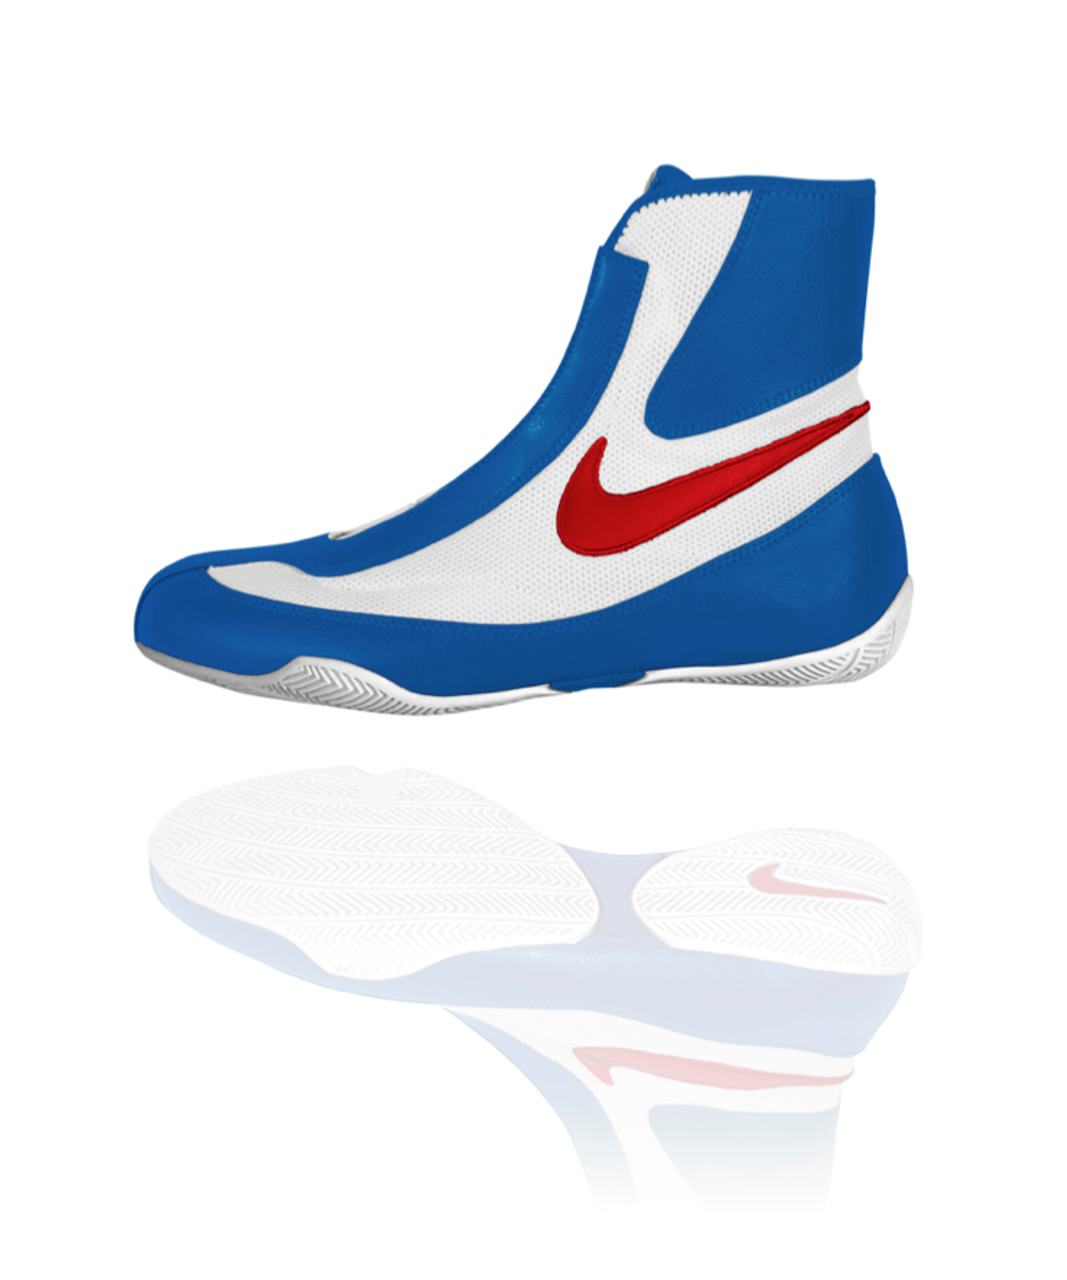 NIKE Machomai MID TOP Boxing Shoes